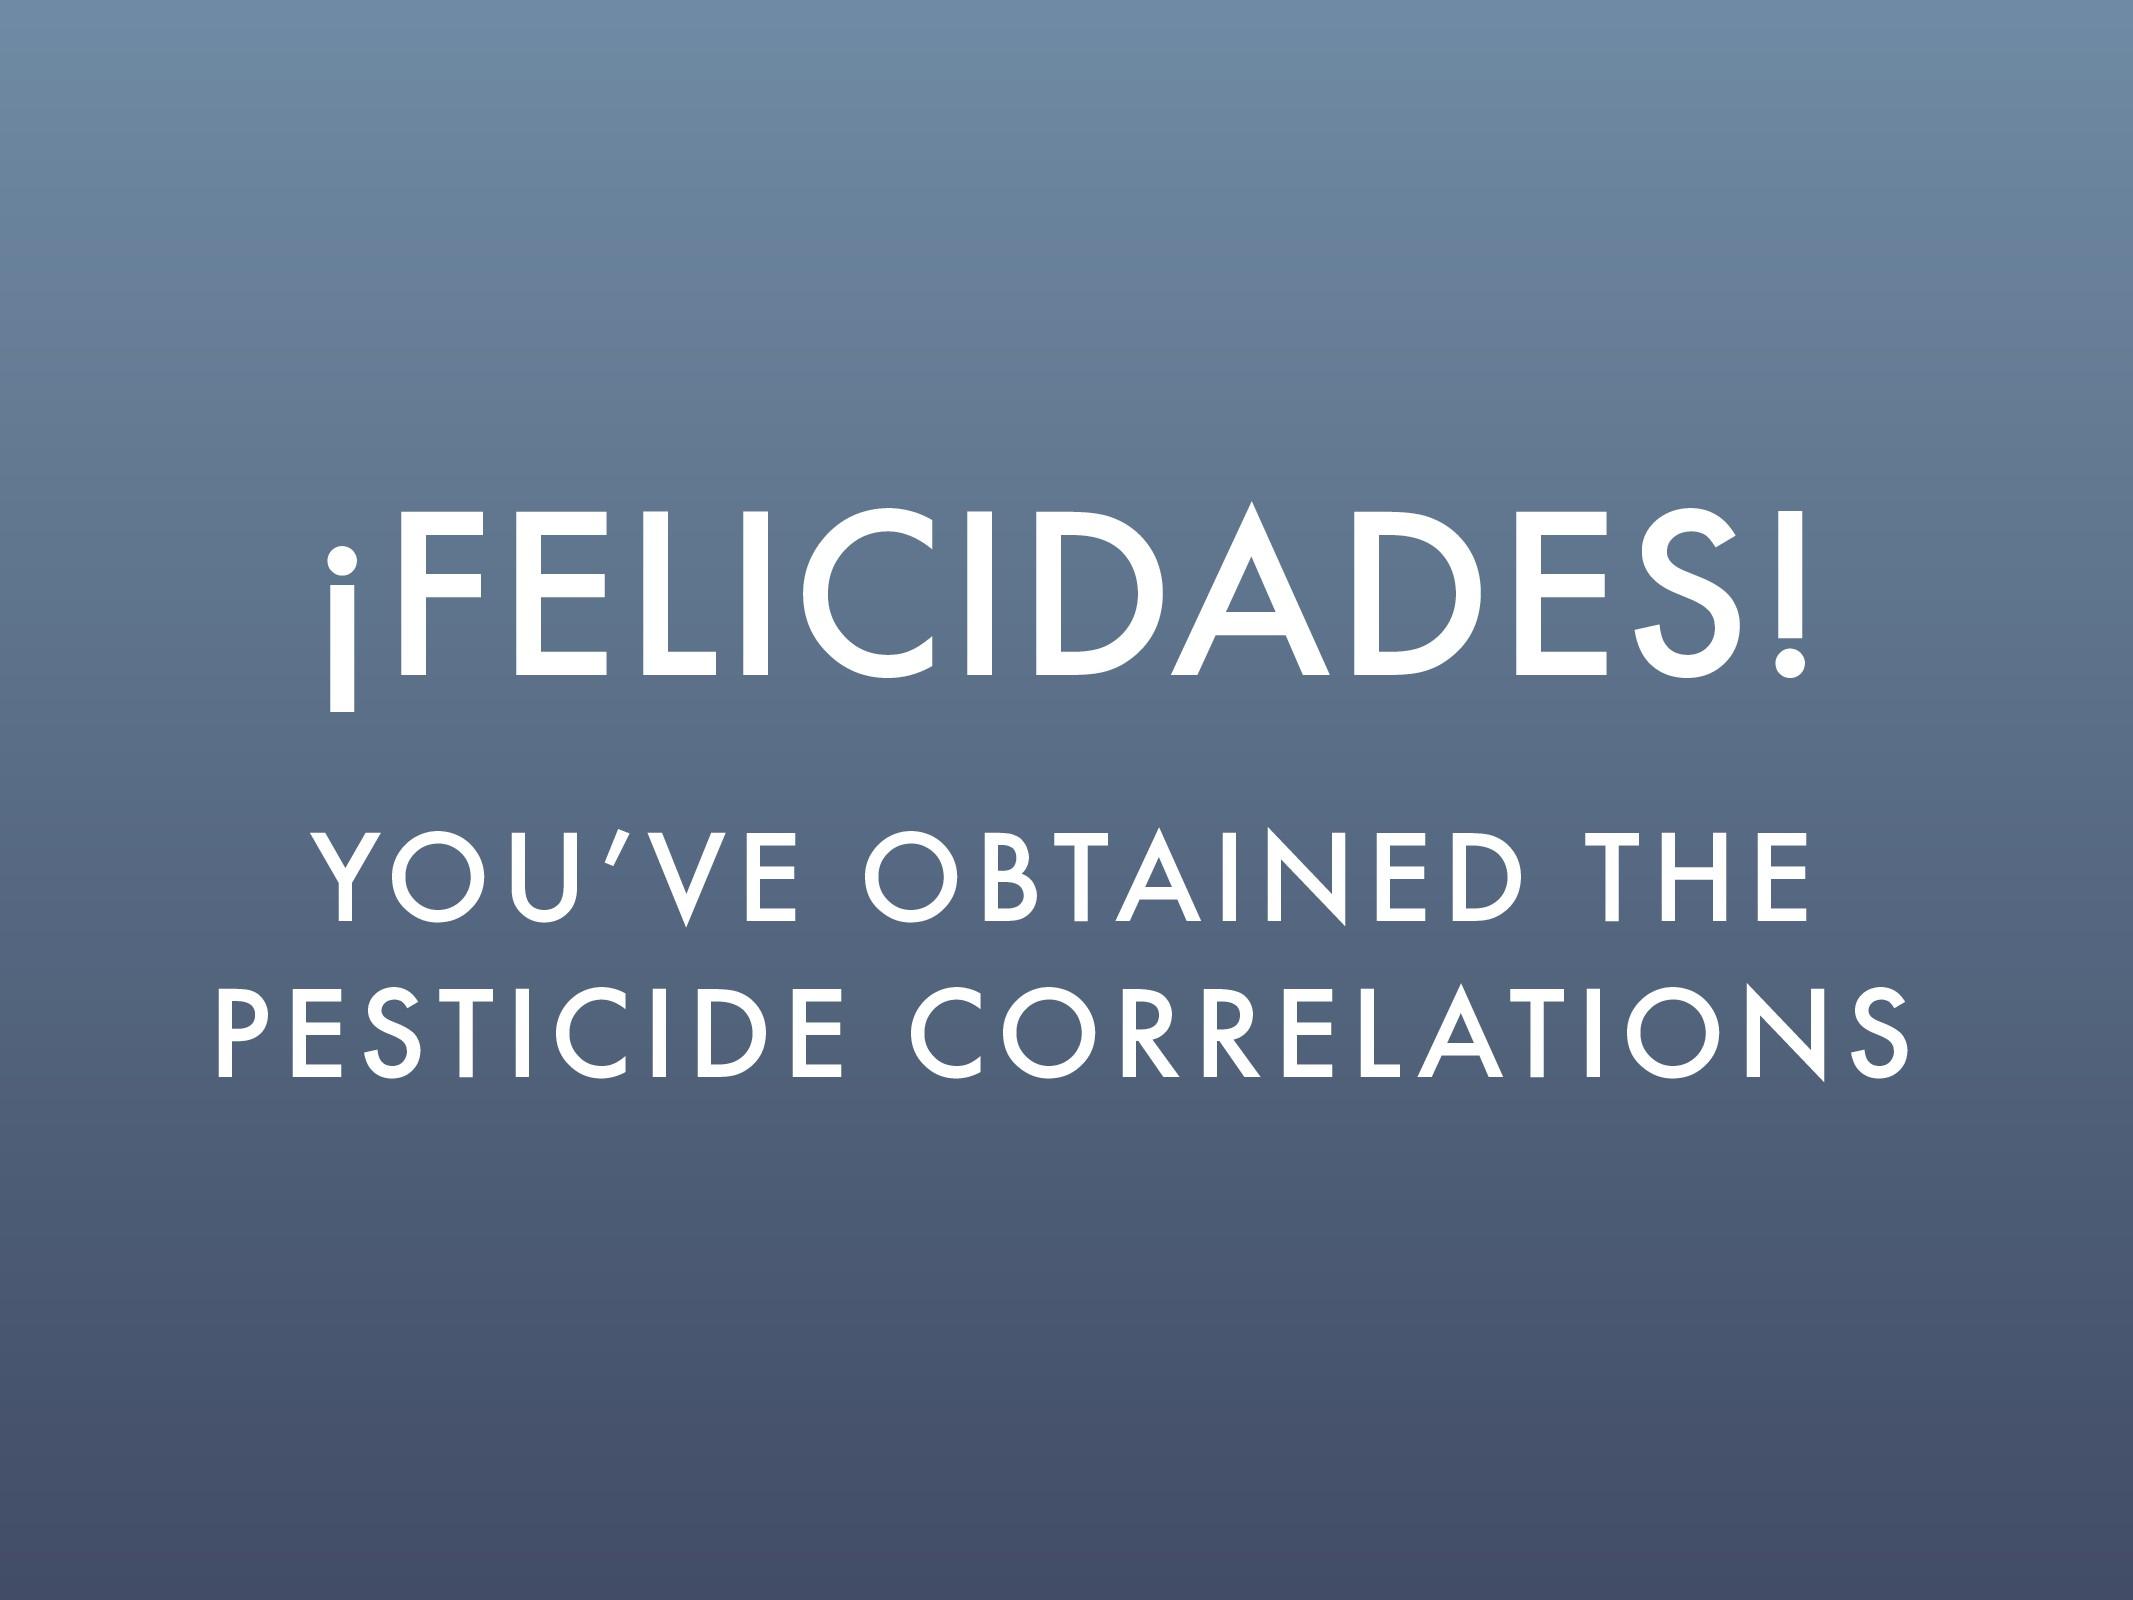 ¡FELICIDADES! YOU'VE OBTAINED THE PESTICIDE COR...